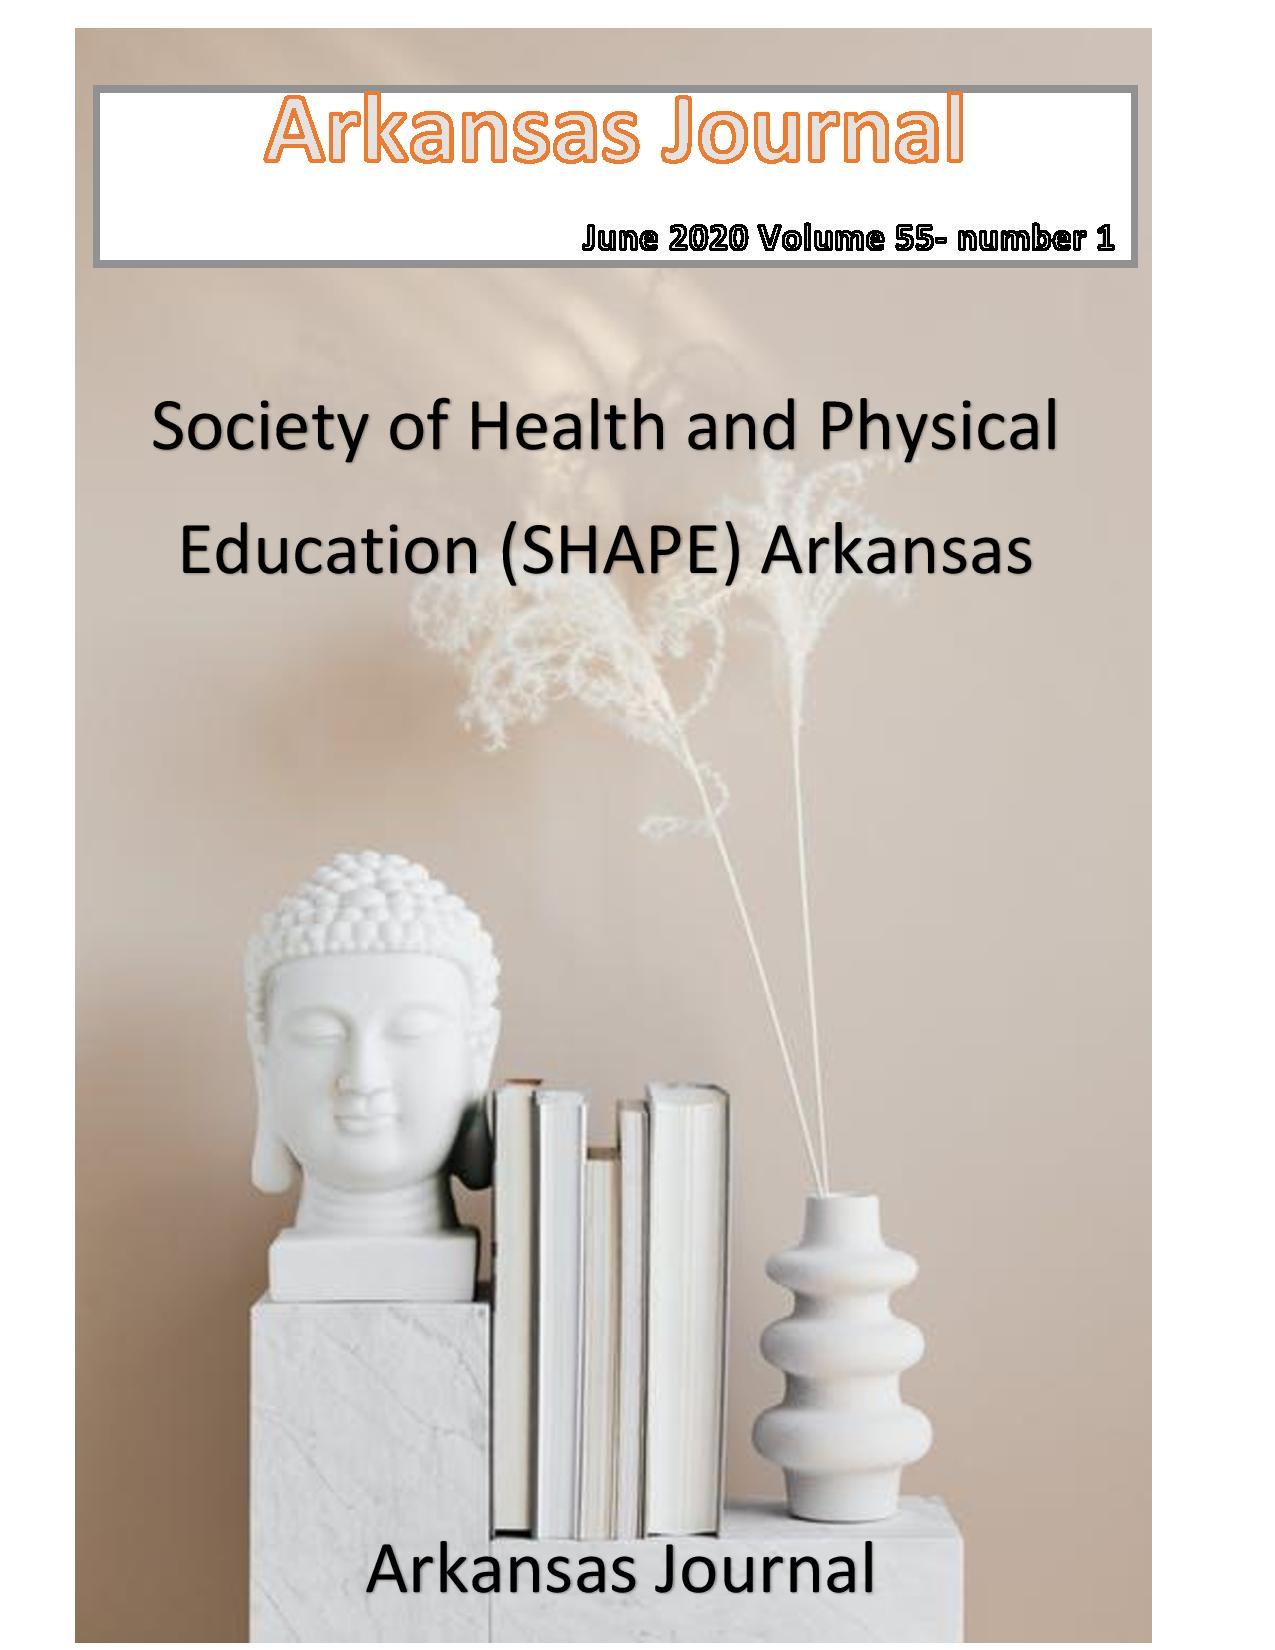 2020 Arkansas Journal June volume 55 number 1 cover -page-001